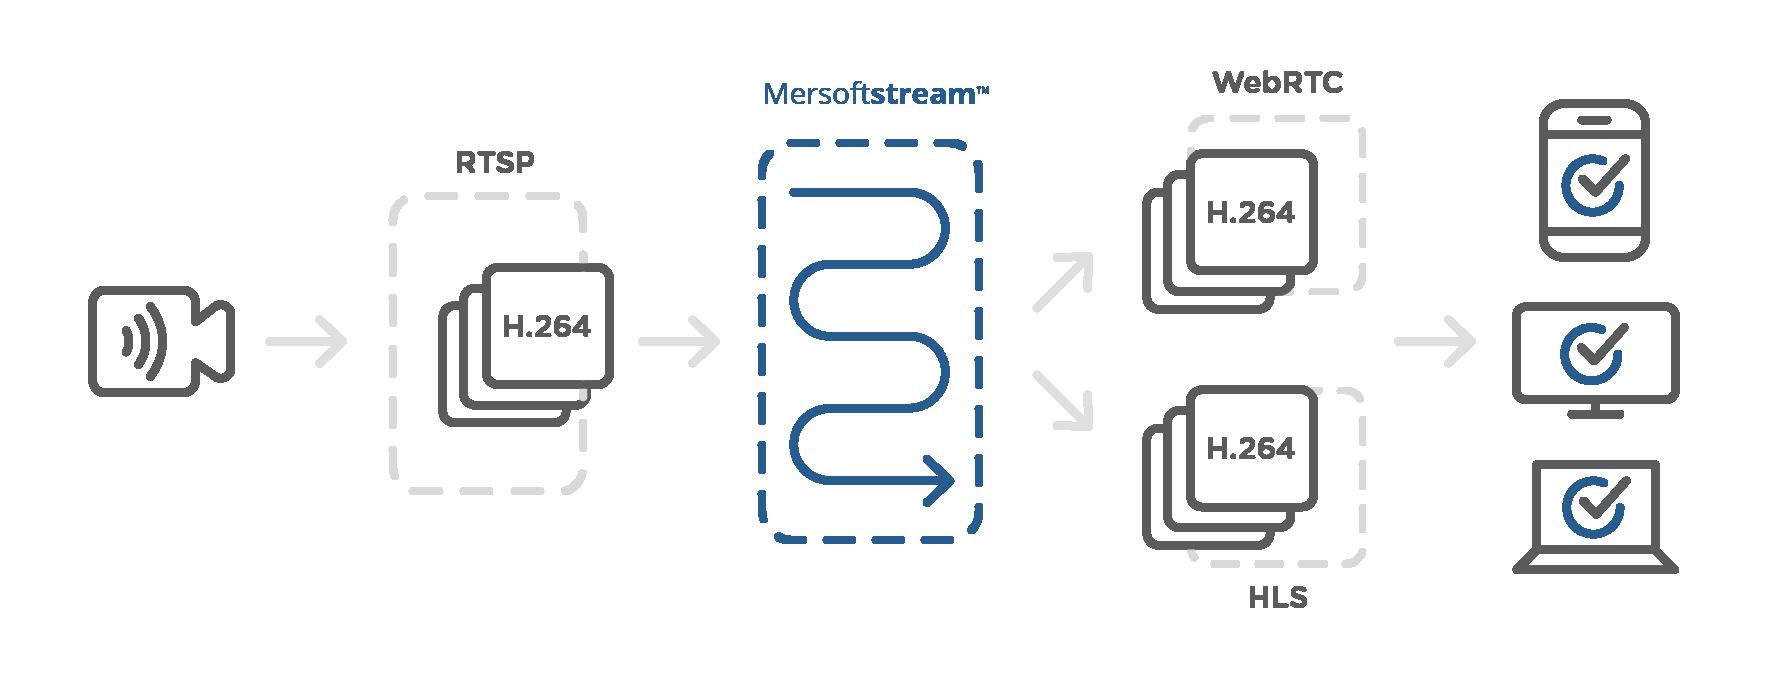 RTSP Live Streaming to WebRTC Mersoft stream - Mersoft